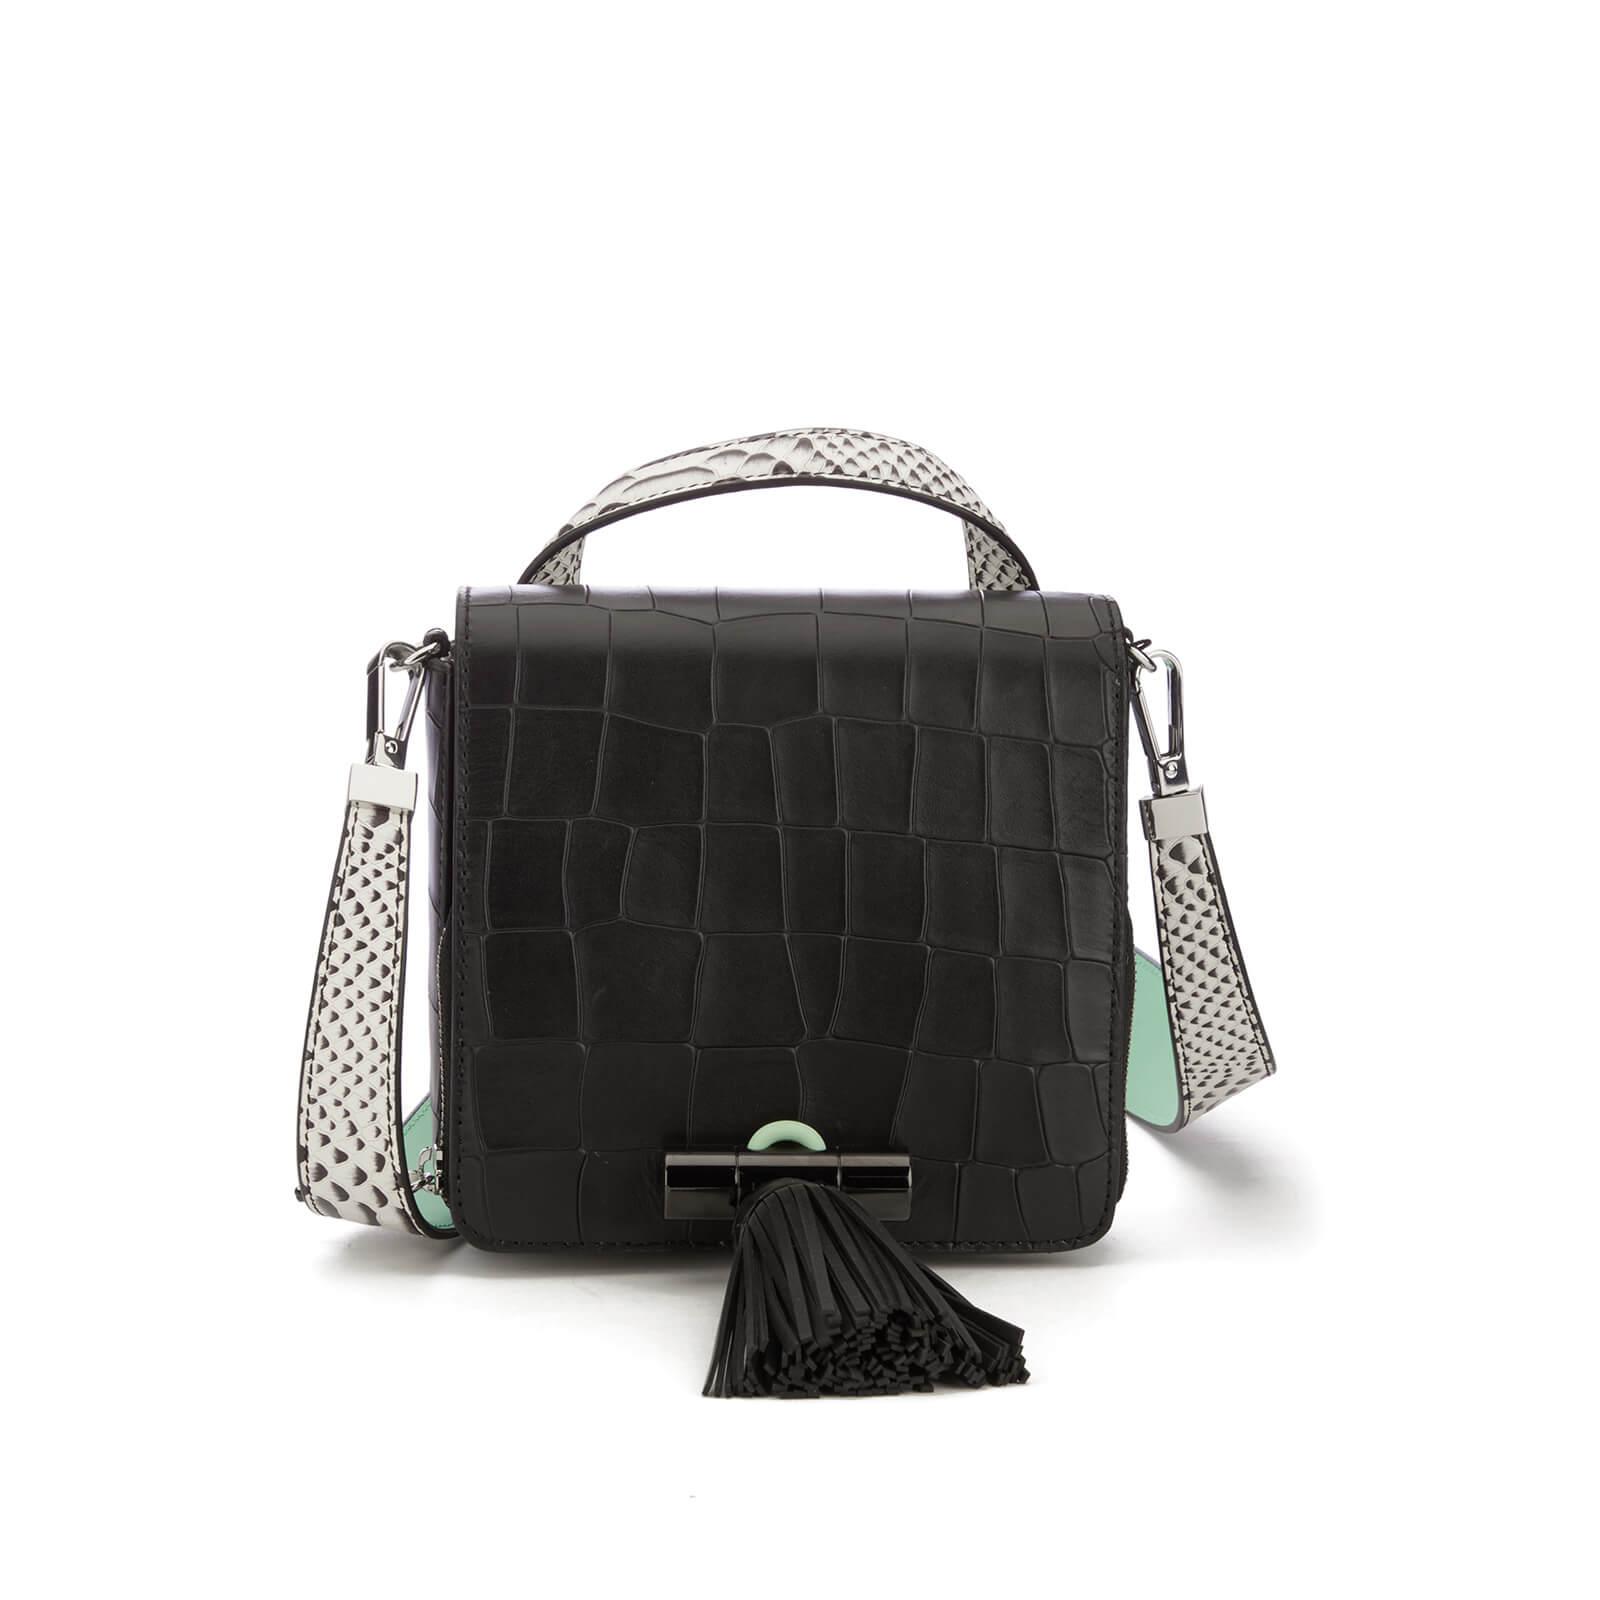 a571bb7d KENZO Women's Runway Small Top Handle Bag - Black